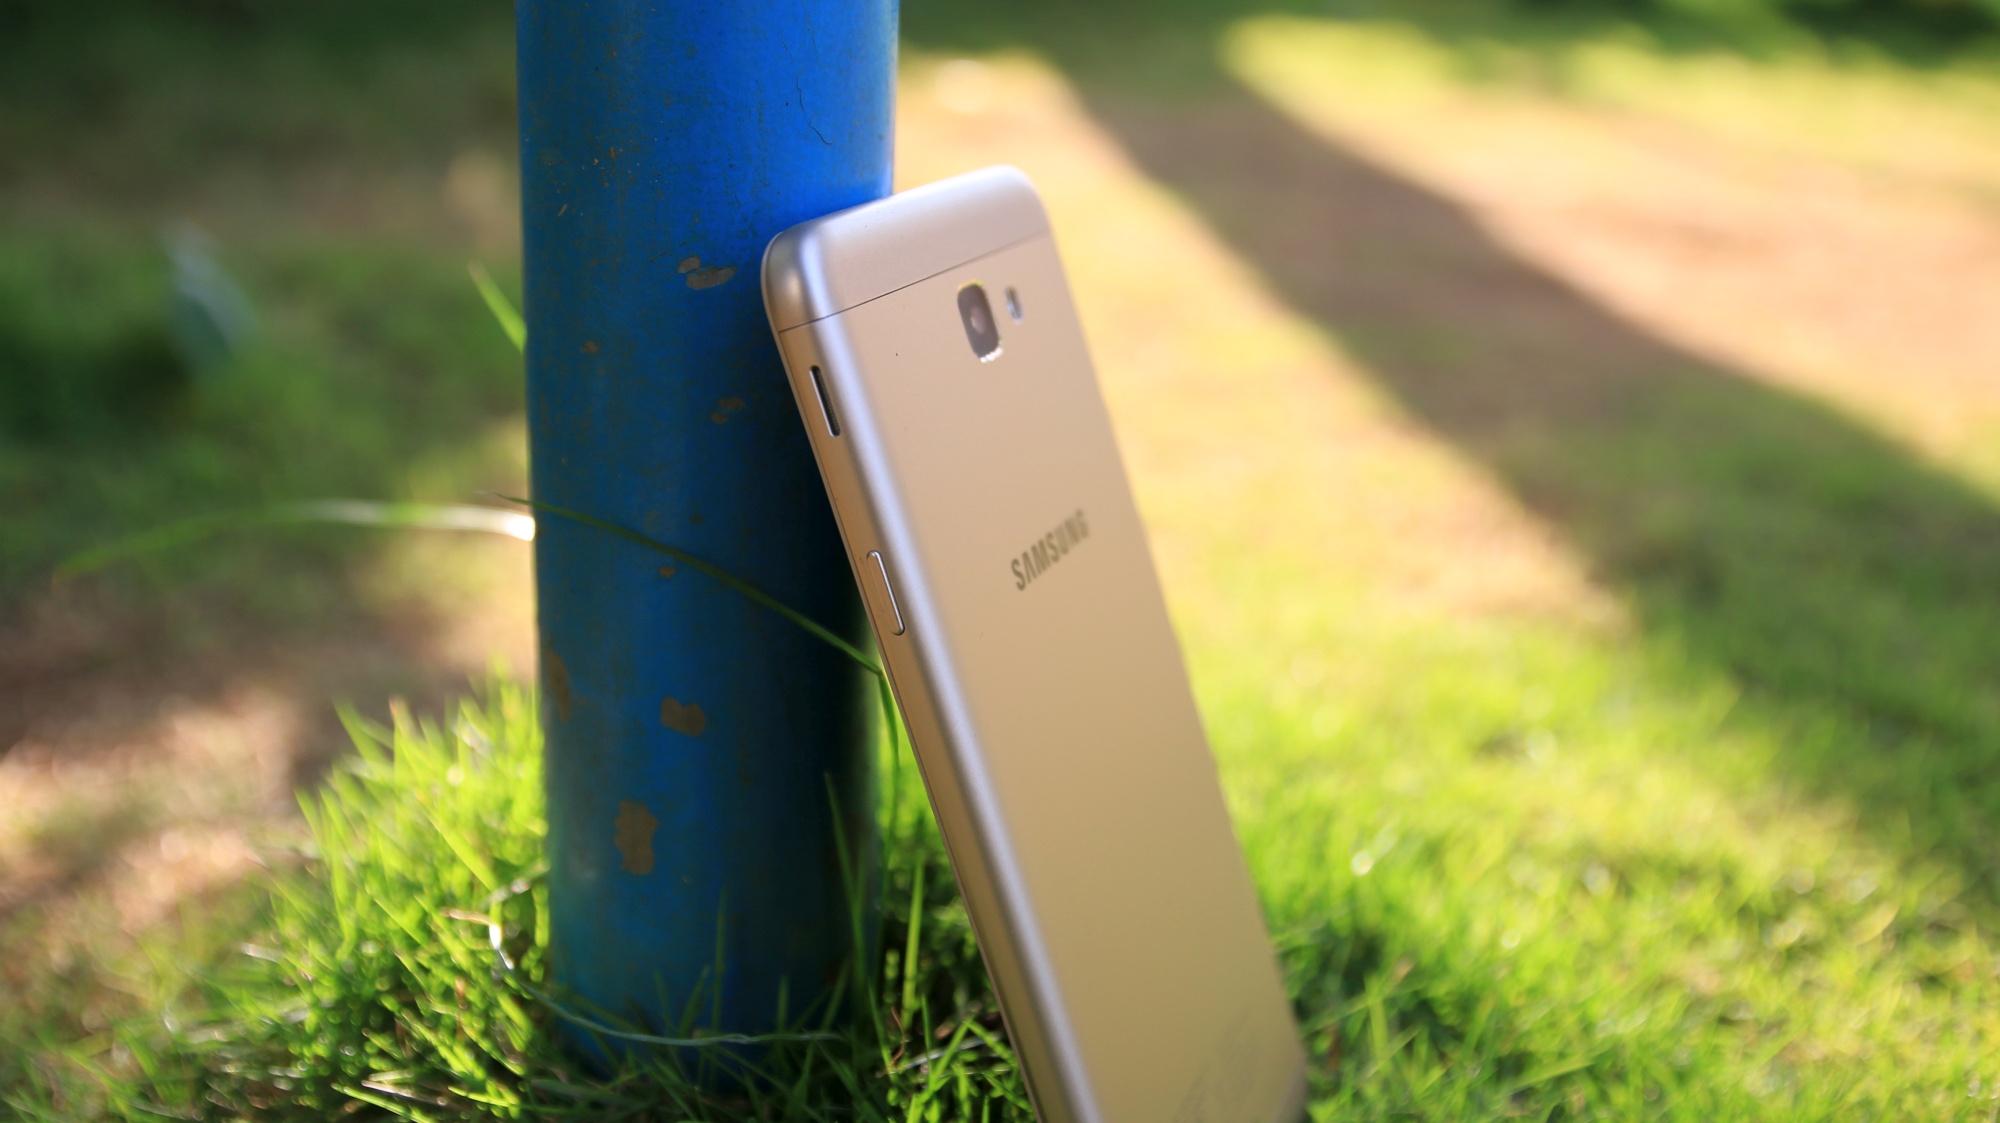 Samsung Galaxy J7 Prime Speaker 2389211 Hd Wallpaper